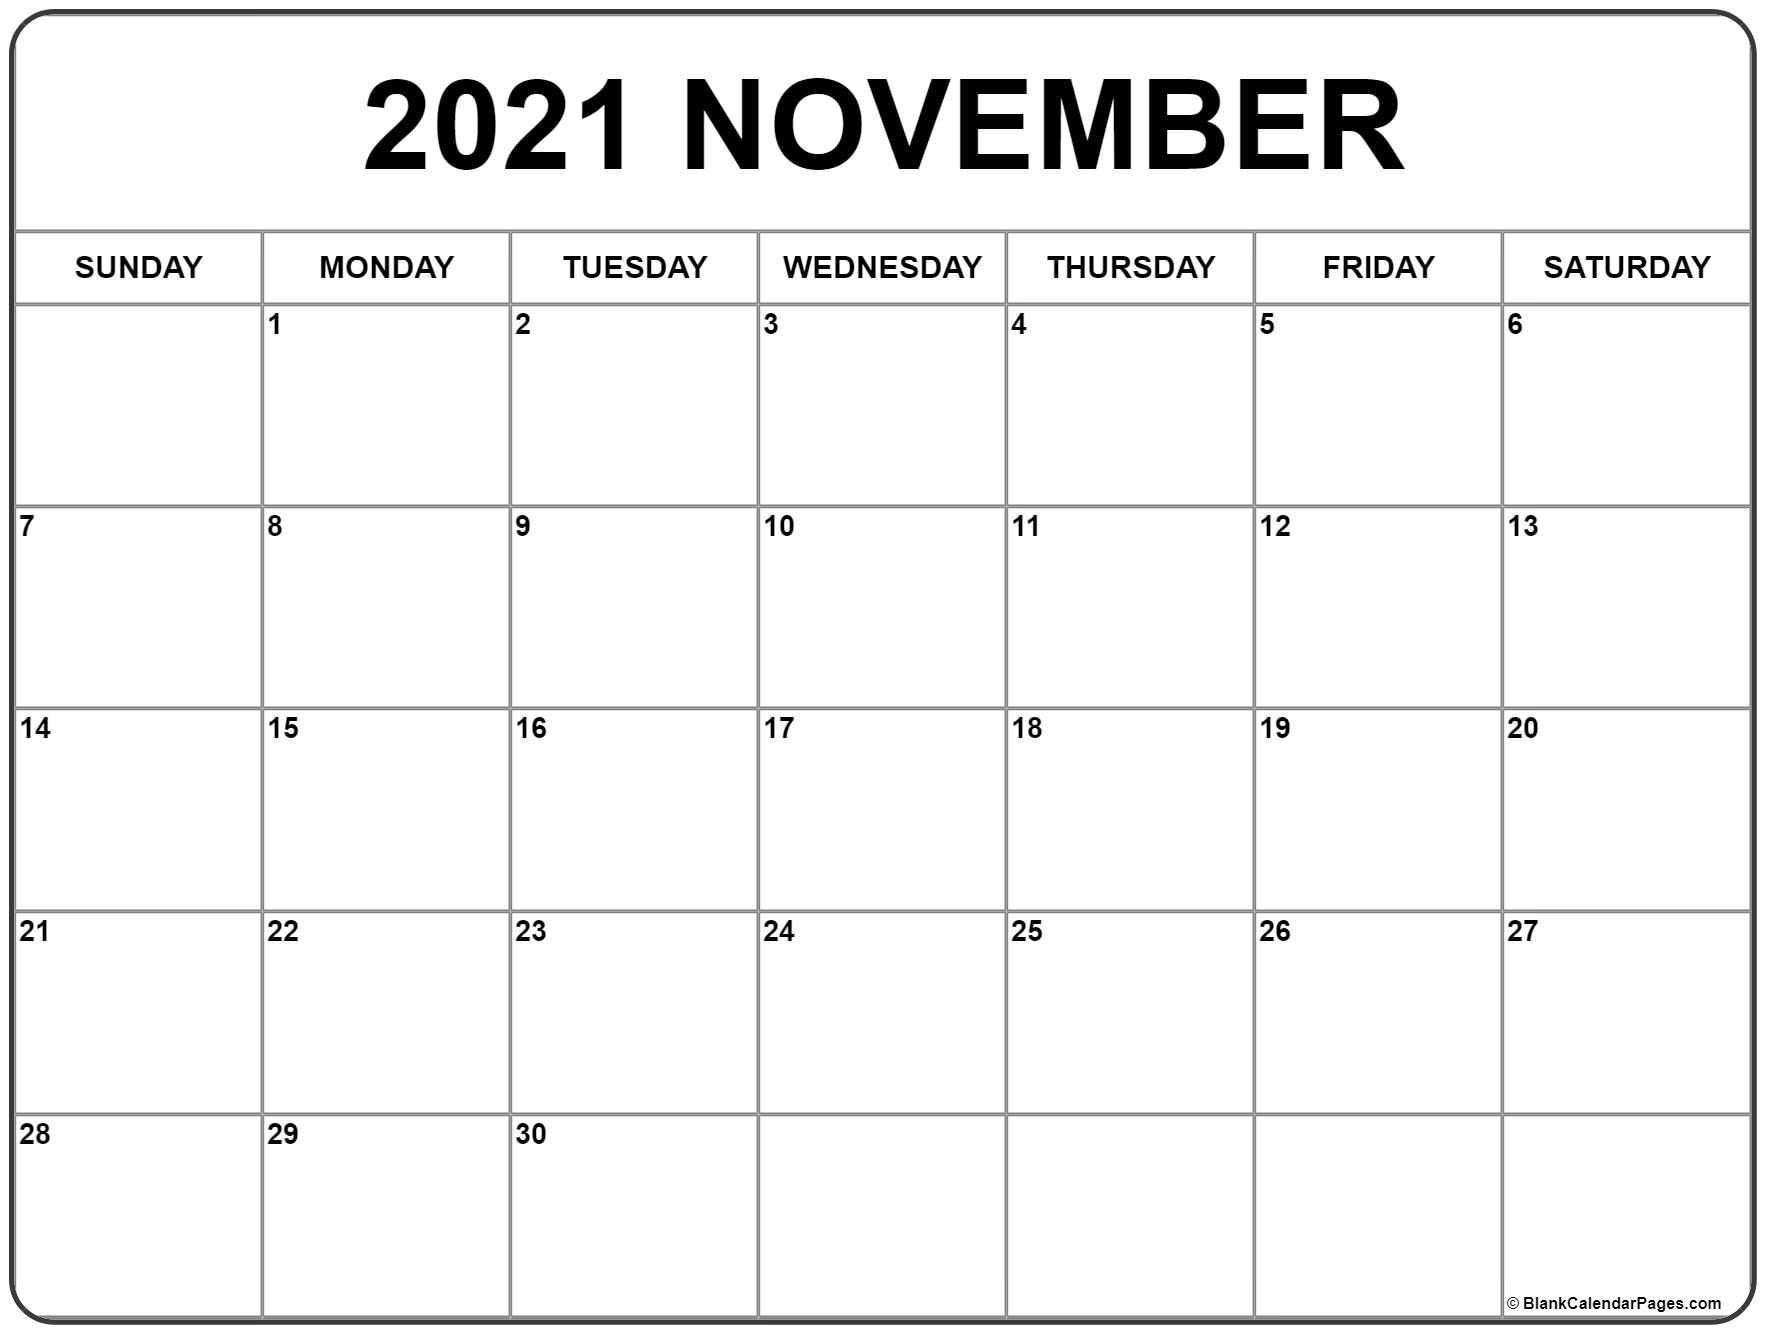 Take 2021 November Calendar Free Image